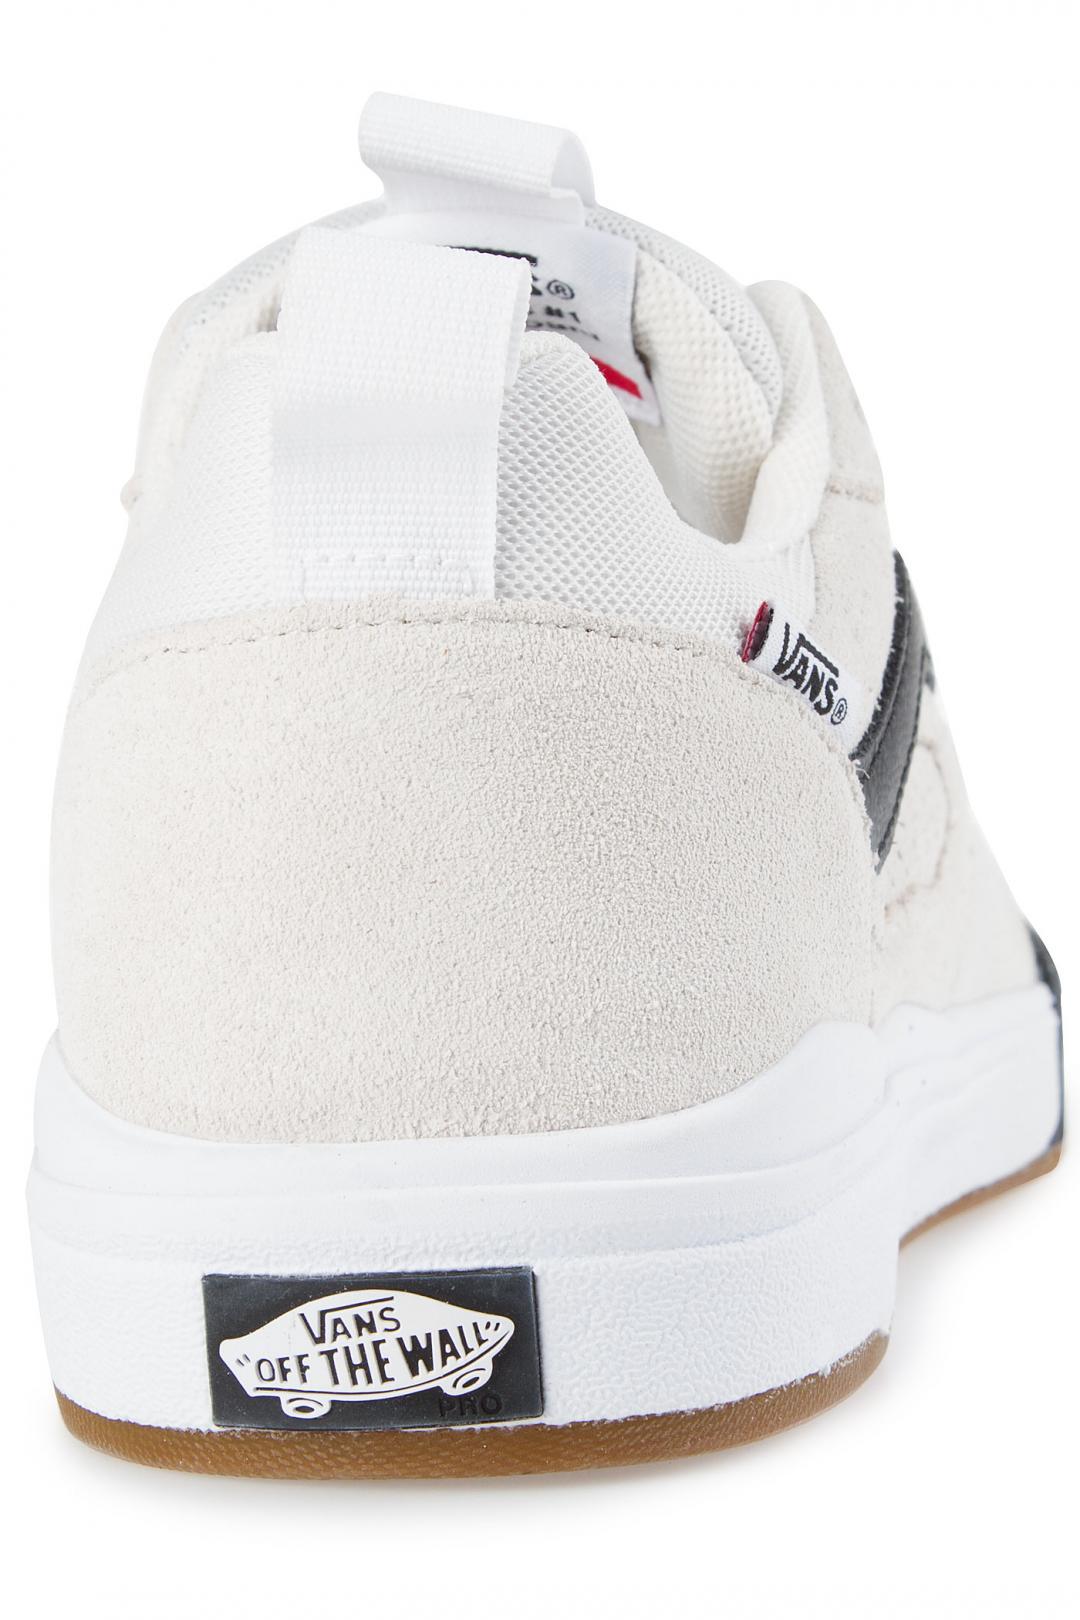 Uomo Vans Ultrarange Pro marshmallow black | Sneakers low top